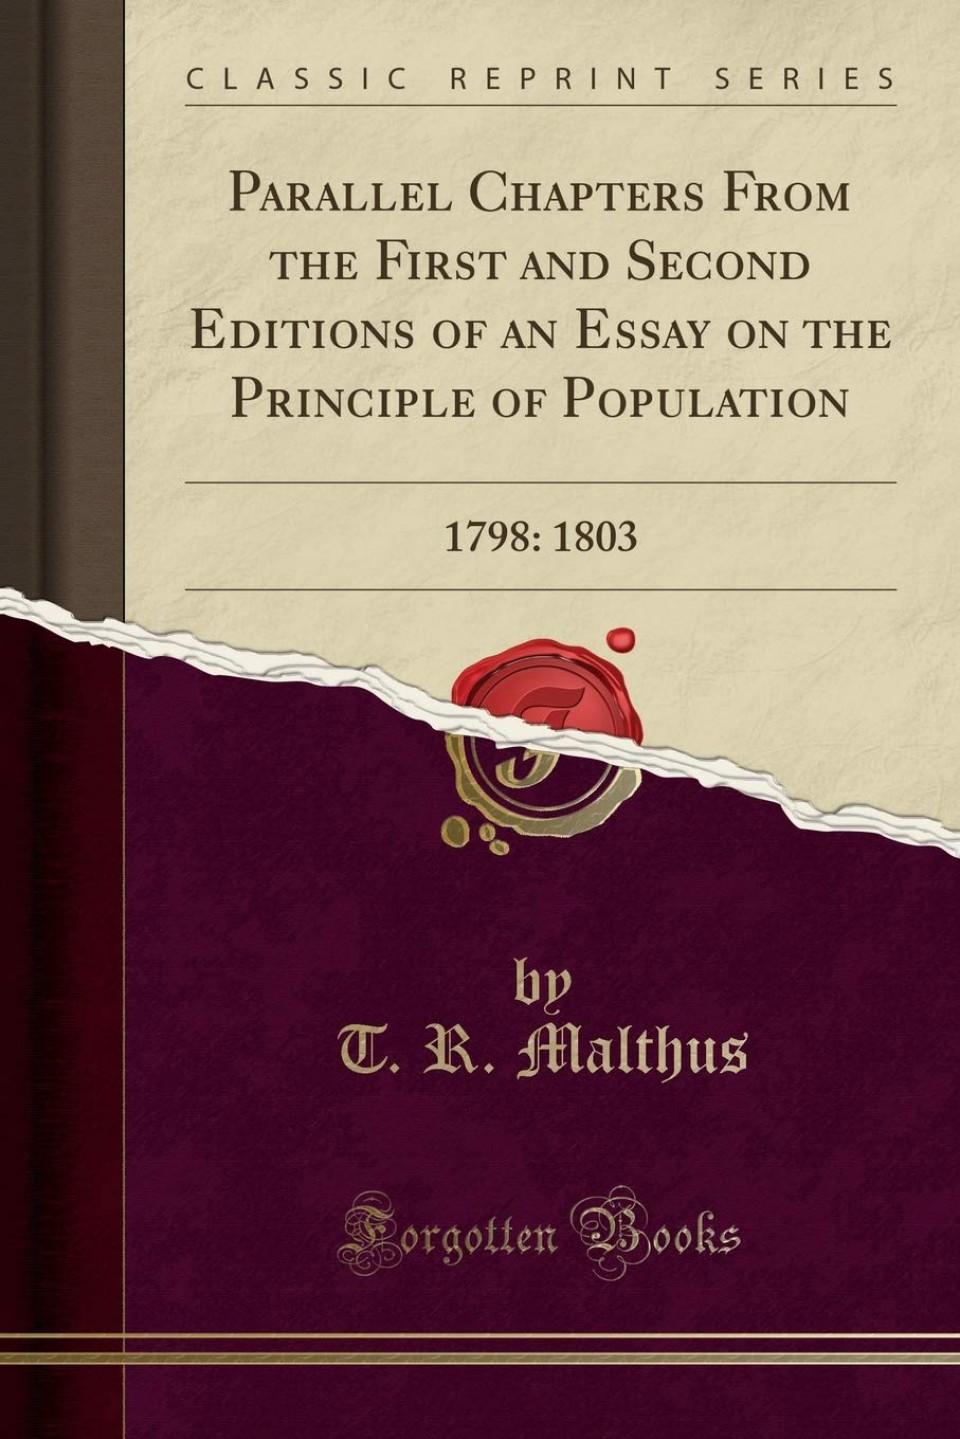 017 61xy24cllwl Essay On The Principle Of Population Singular Malthus Sparknotes Thomas Main Idea 960